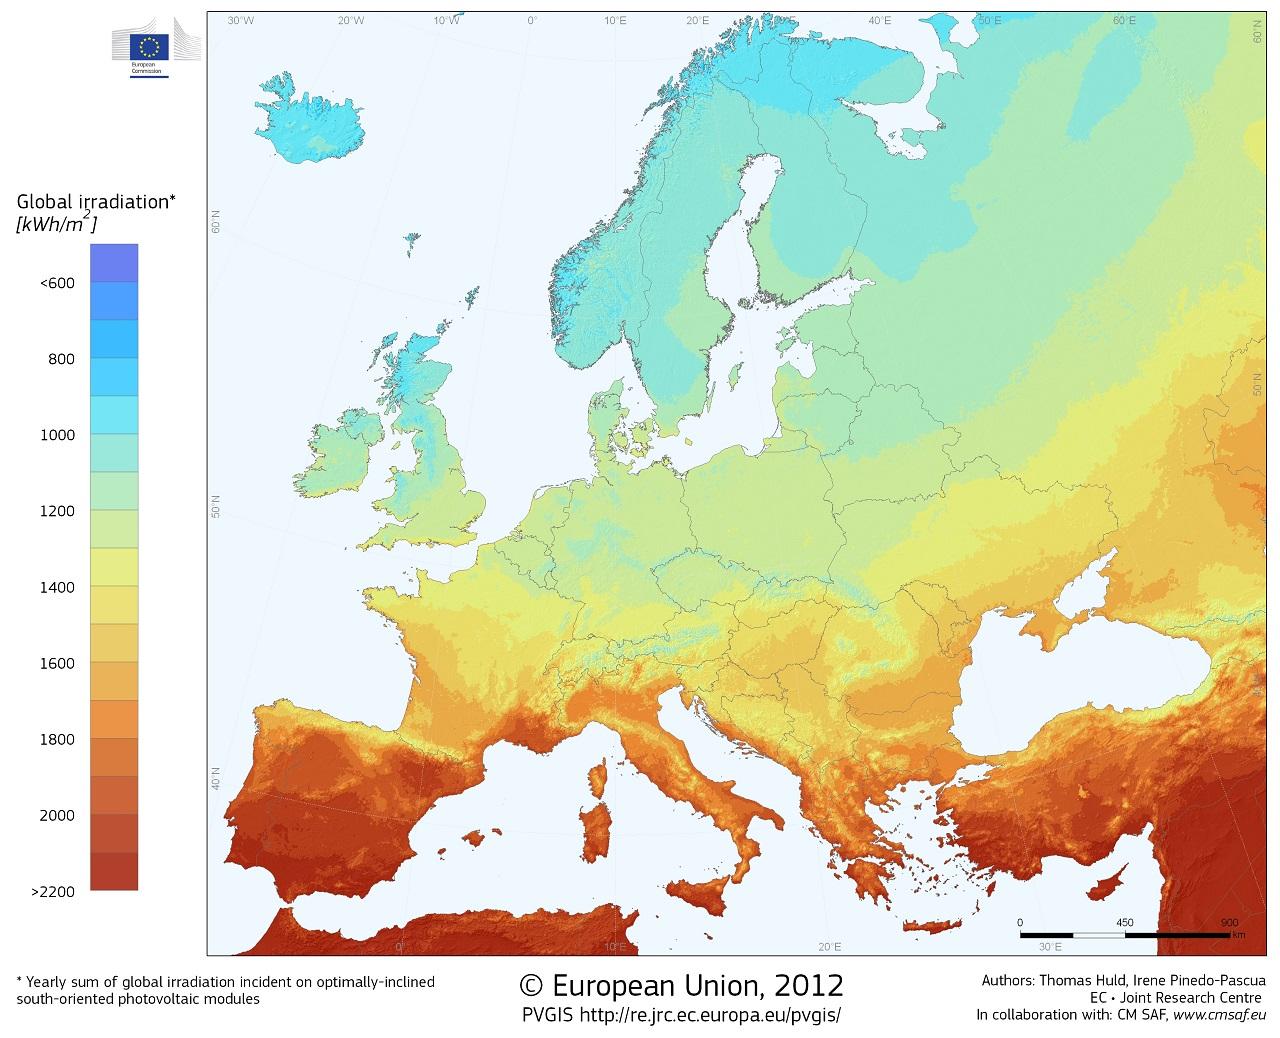 AleaSoft - Energía fotovoltaica en Europa